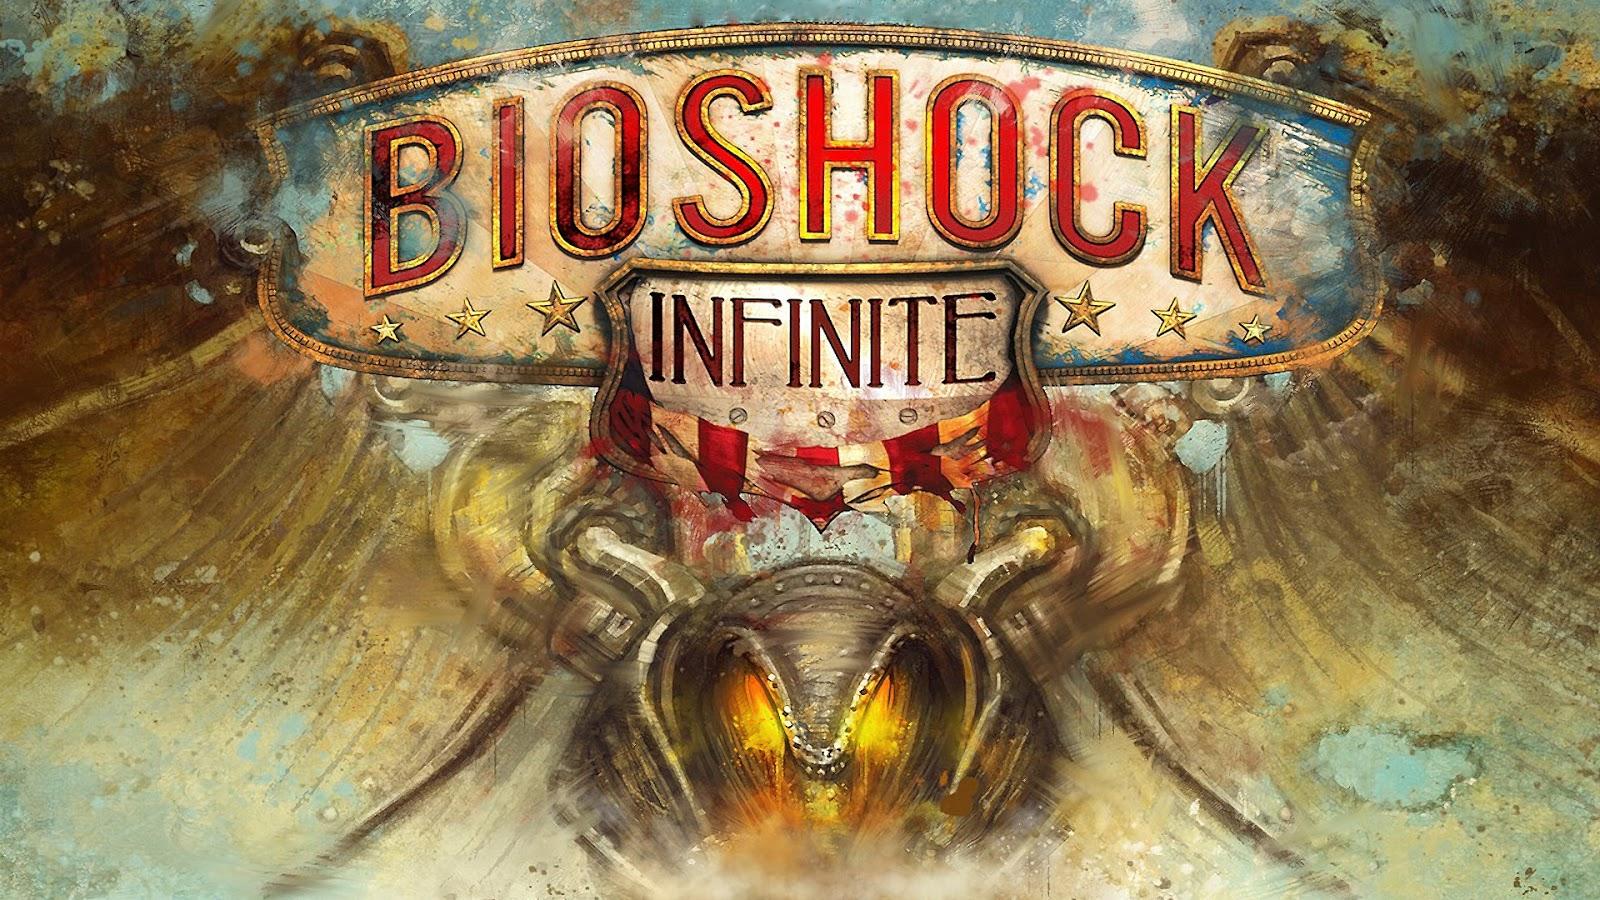 Обои на рабочий стол bioshock infinite